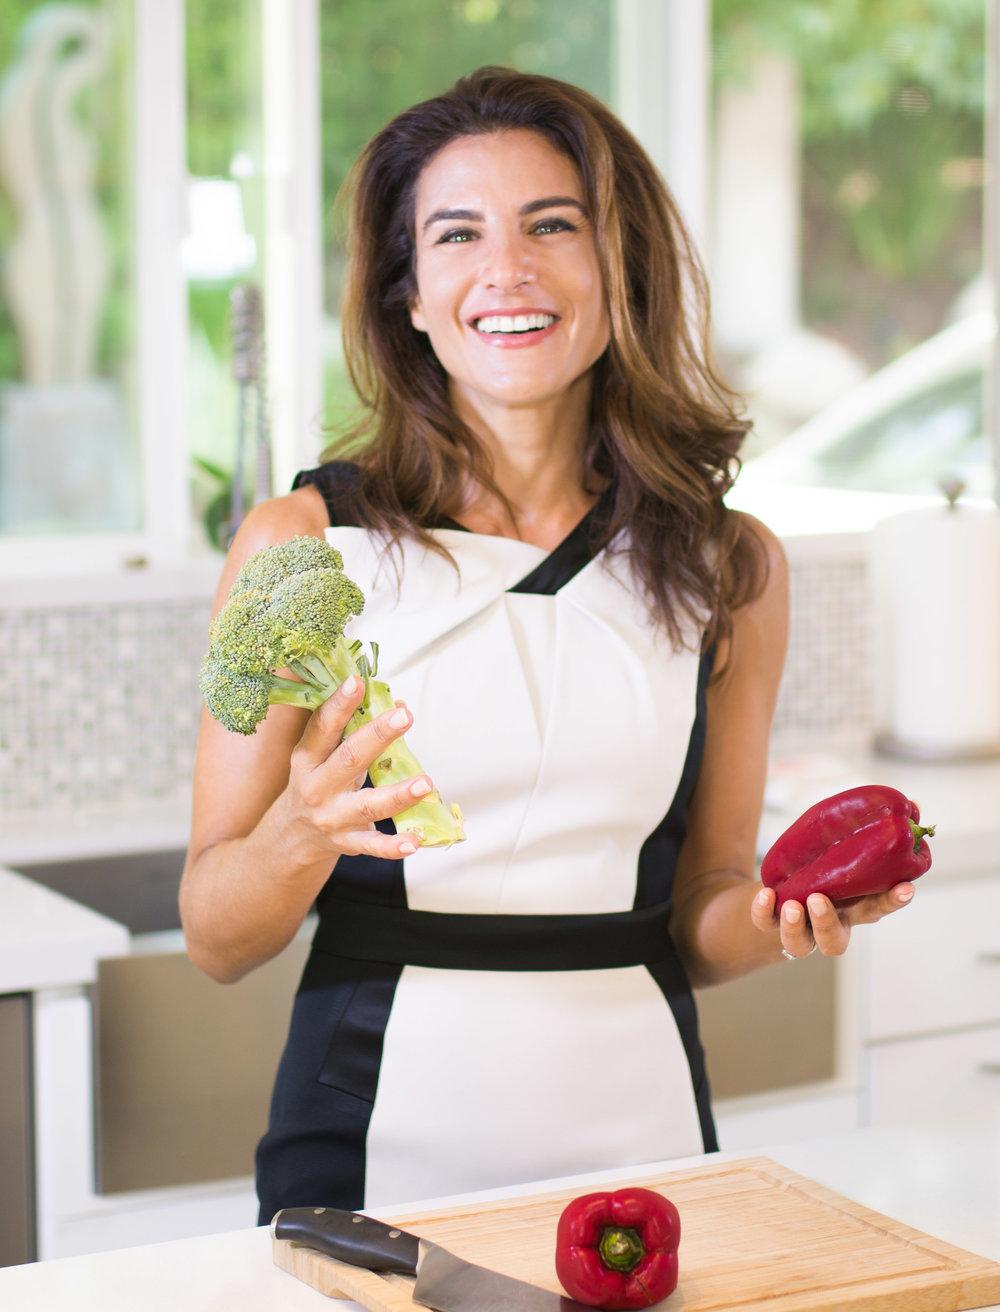 MELISSA MAYO|  Chef, Author, Entrepreneur